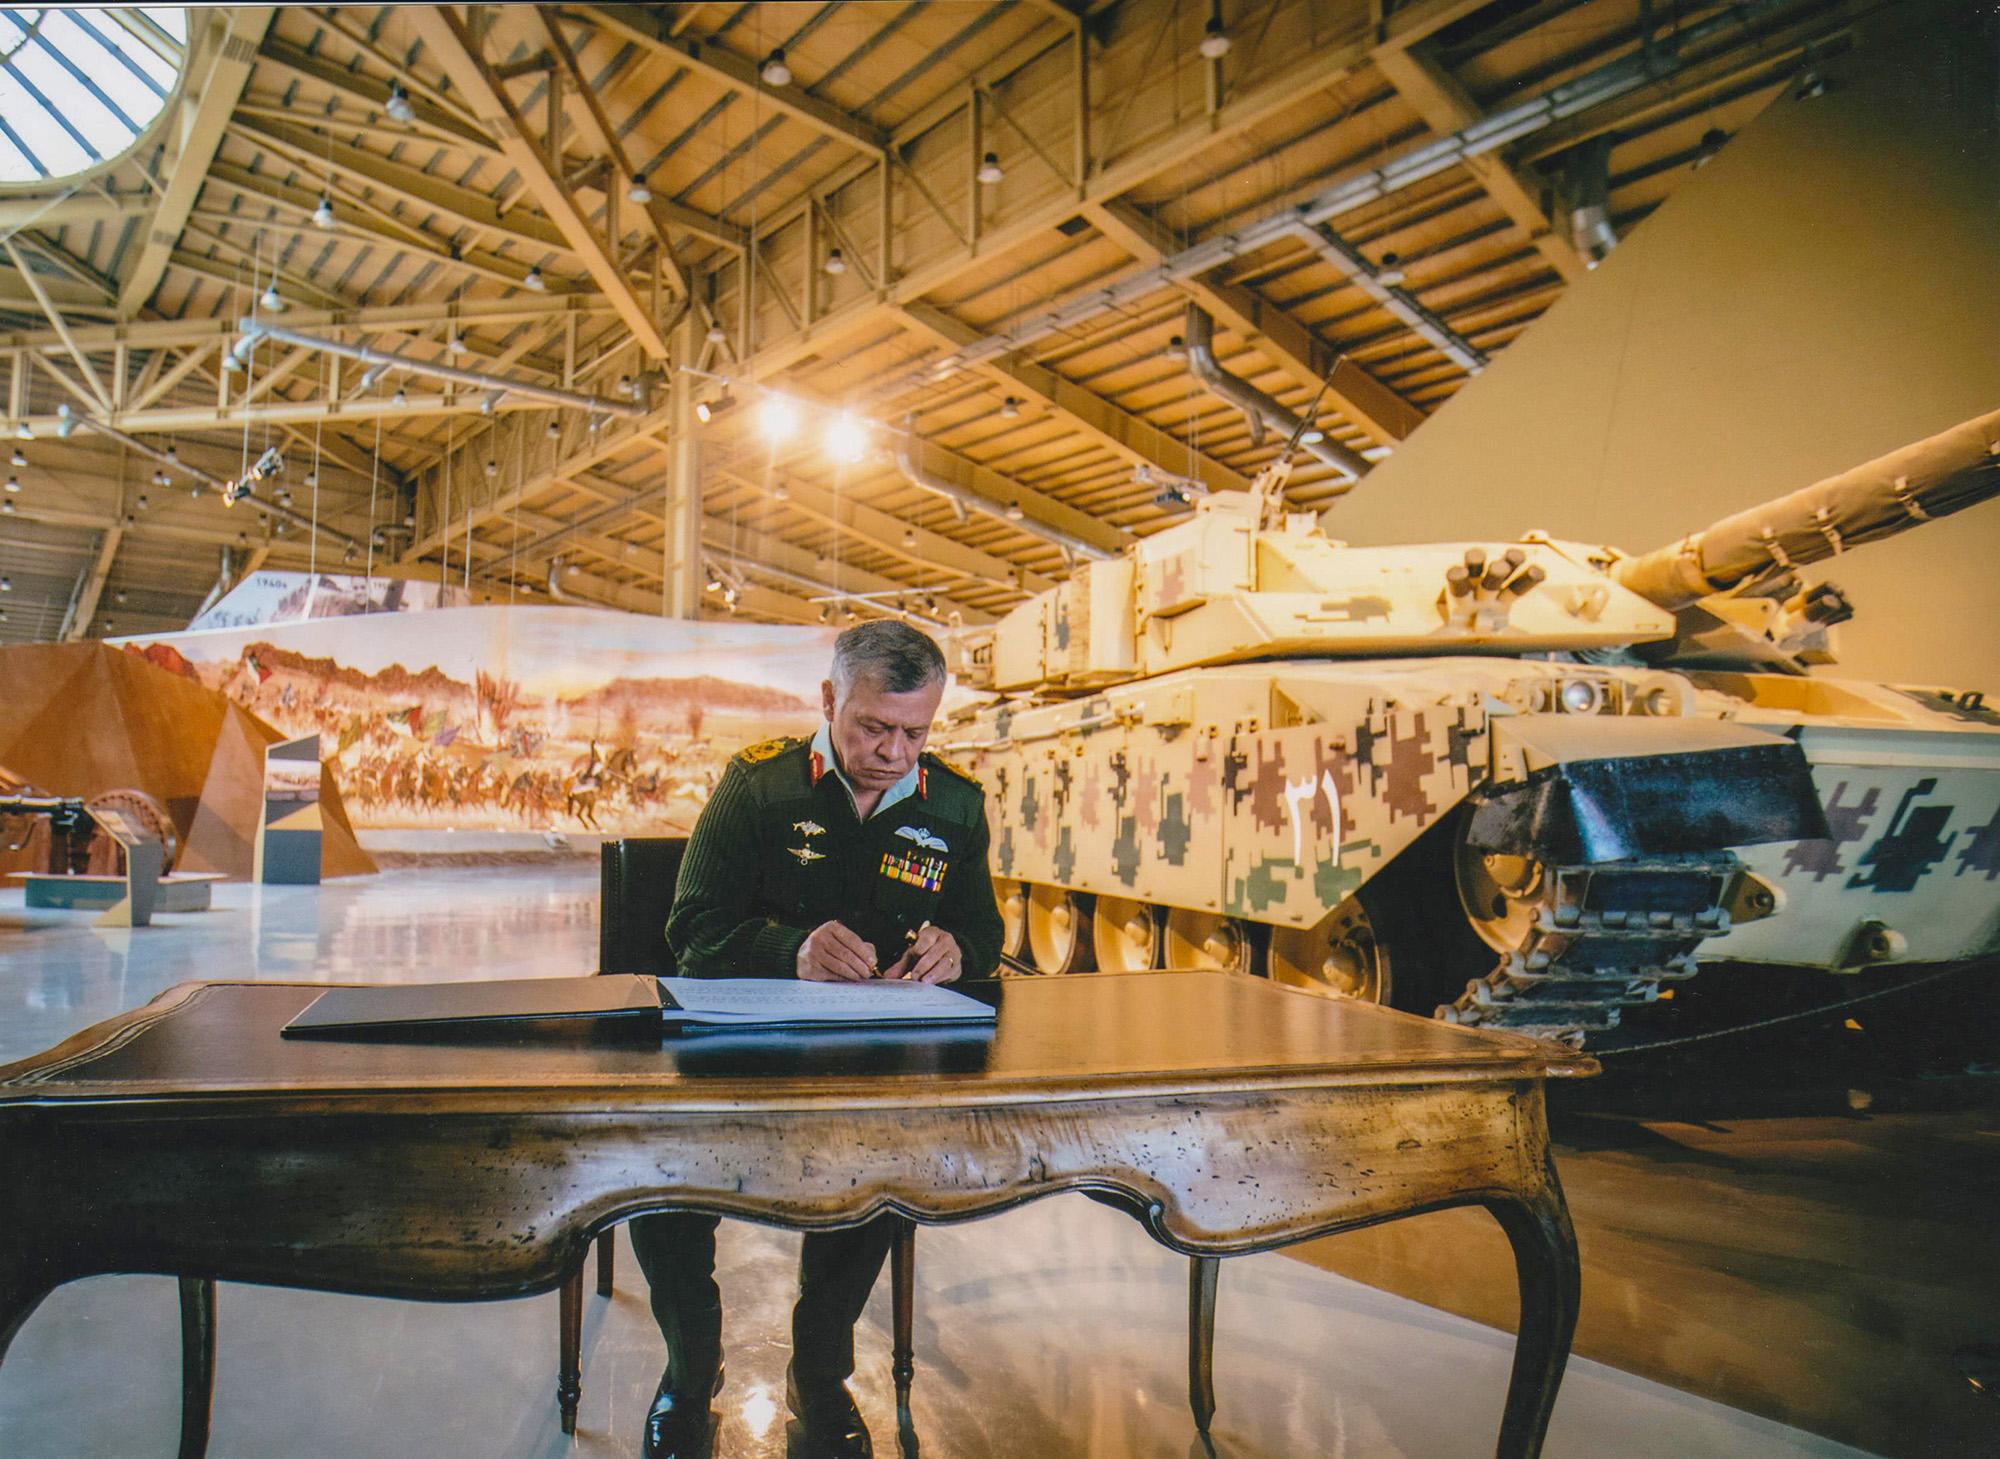 His Majesty King Abdullah II Inaugurates The Royal Tank Museum